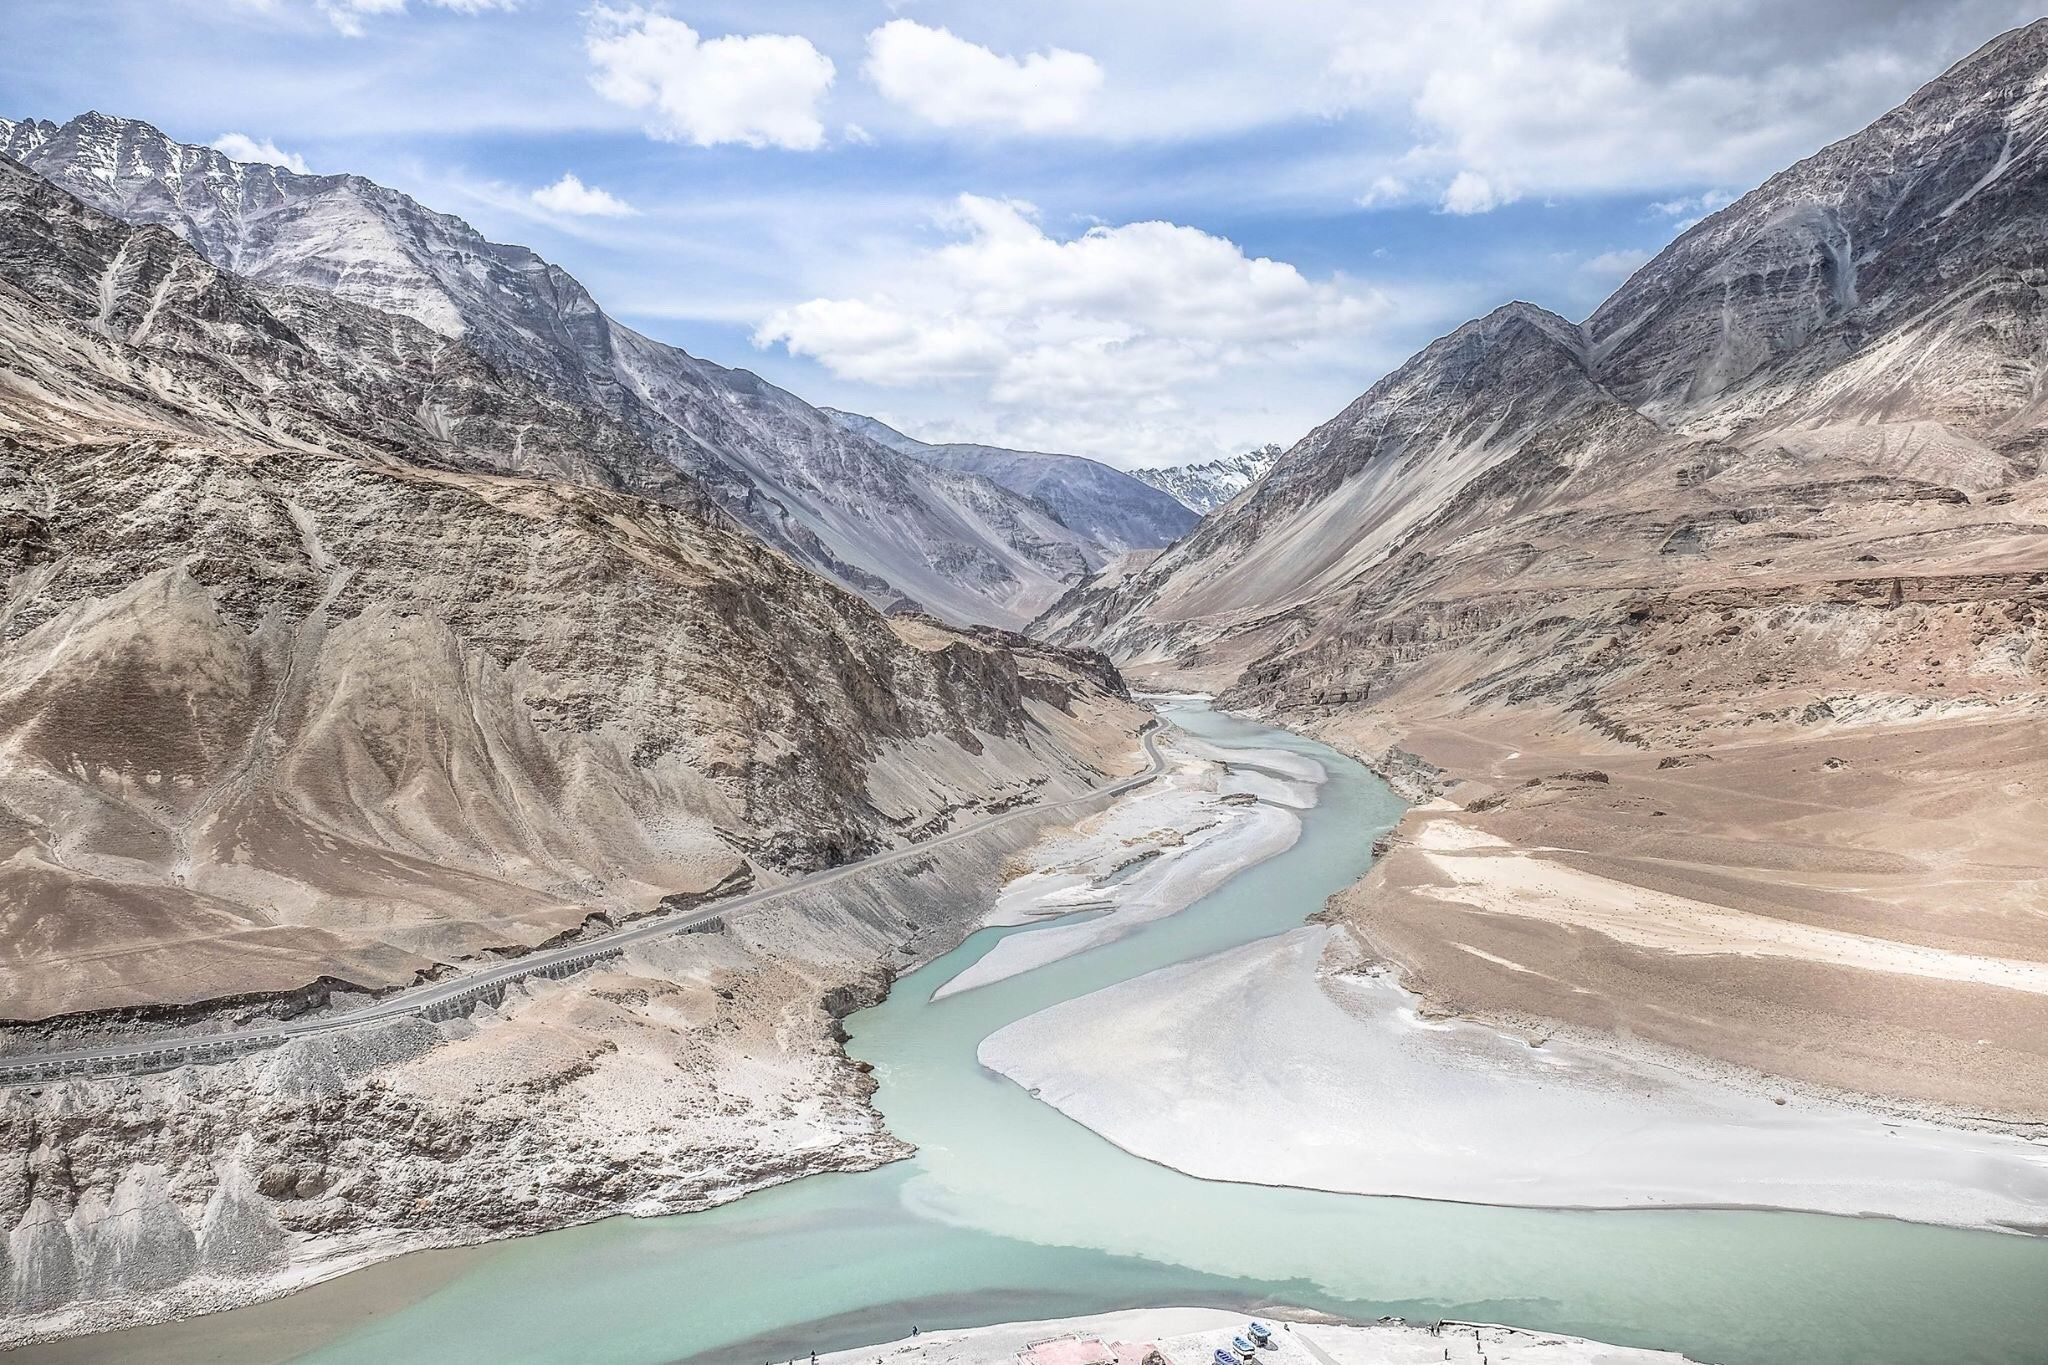 Zanshar river meets Indus river #Ladakh #India